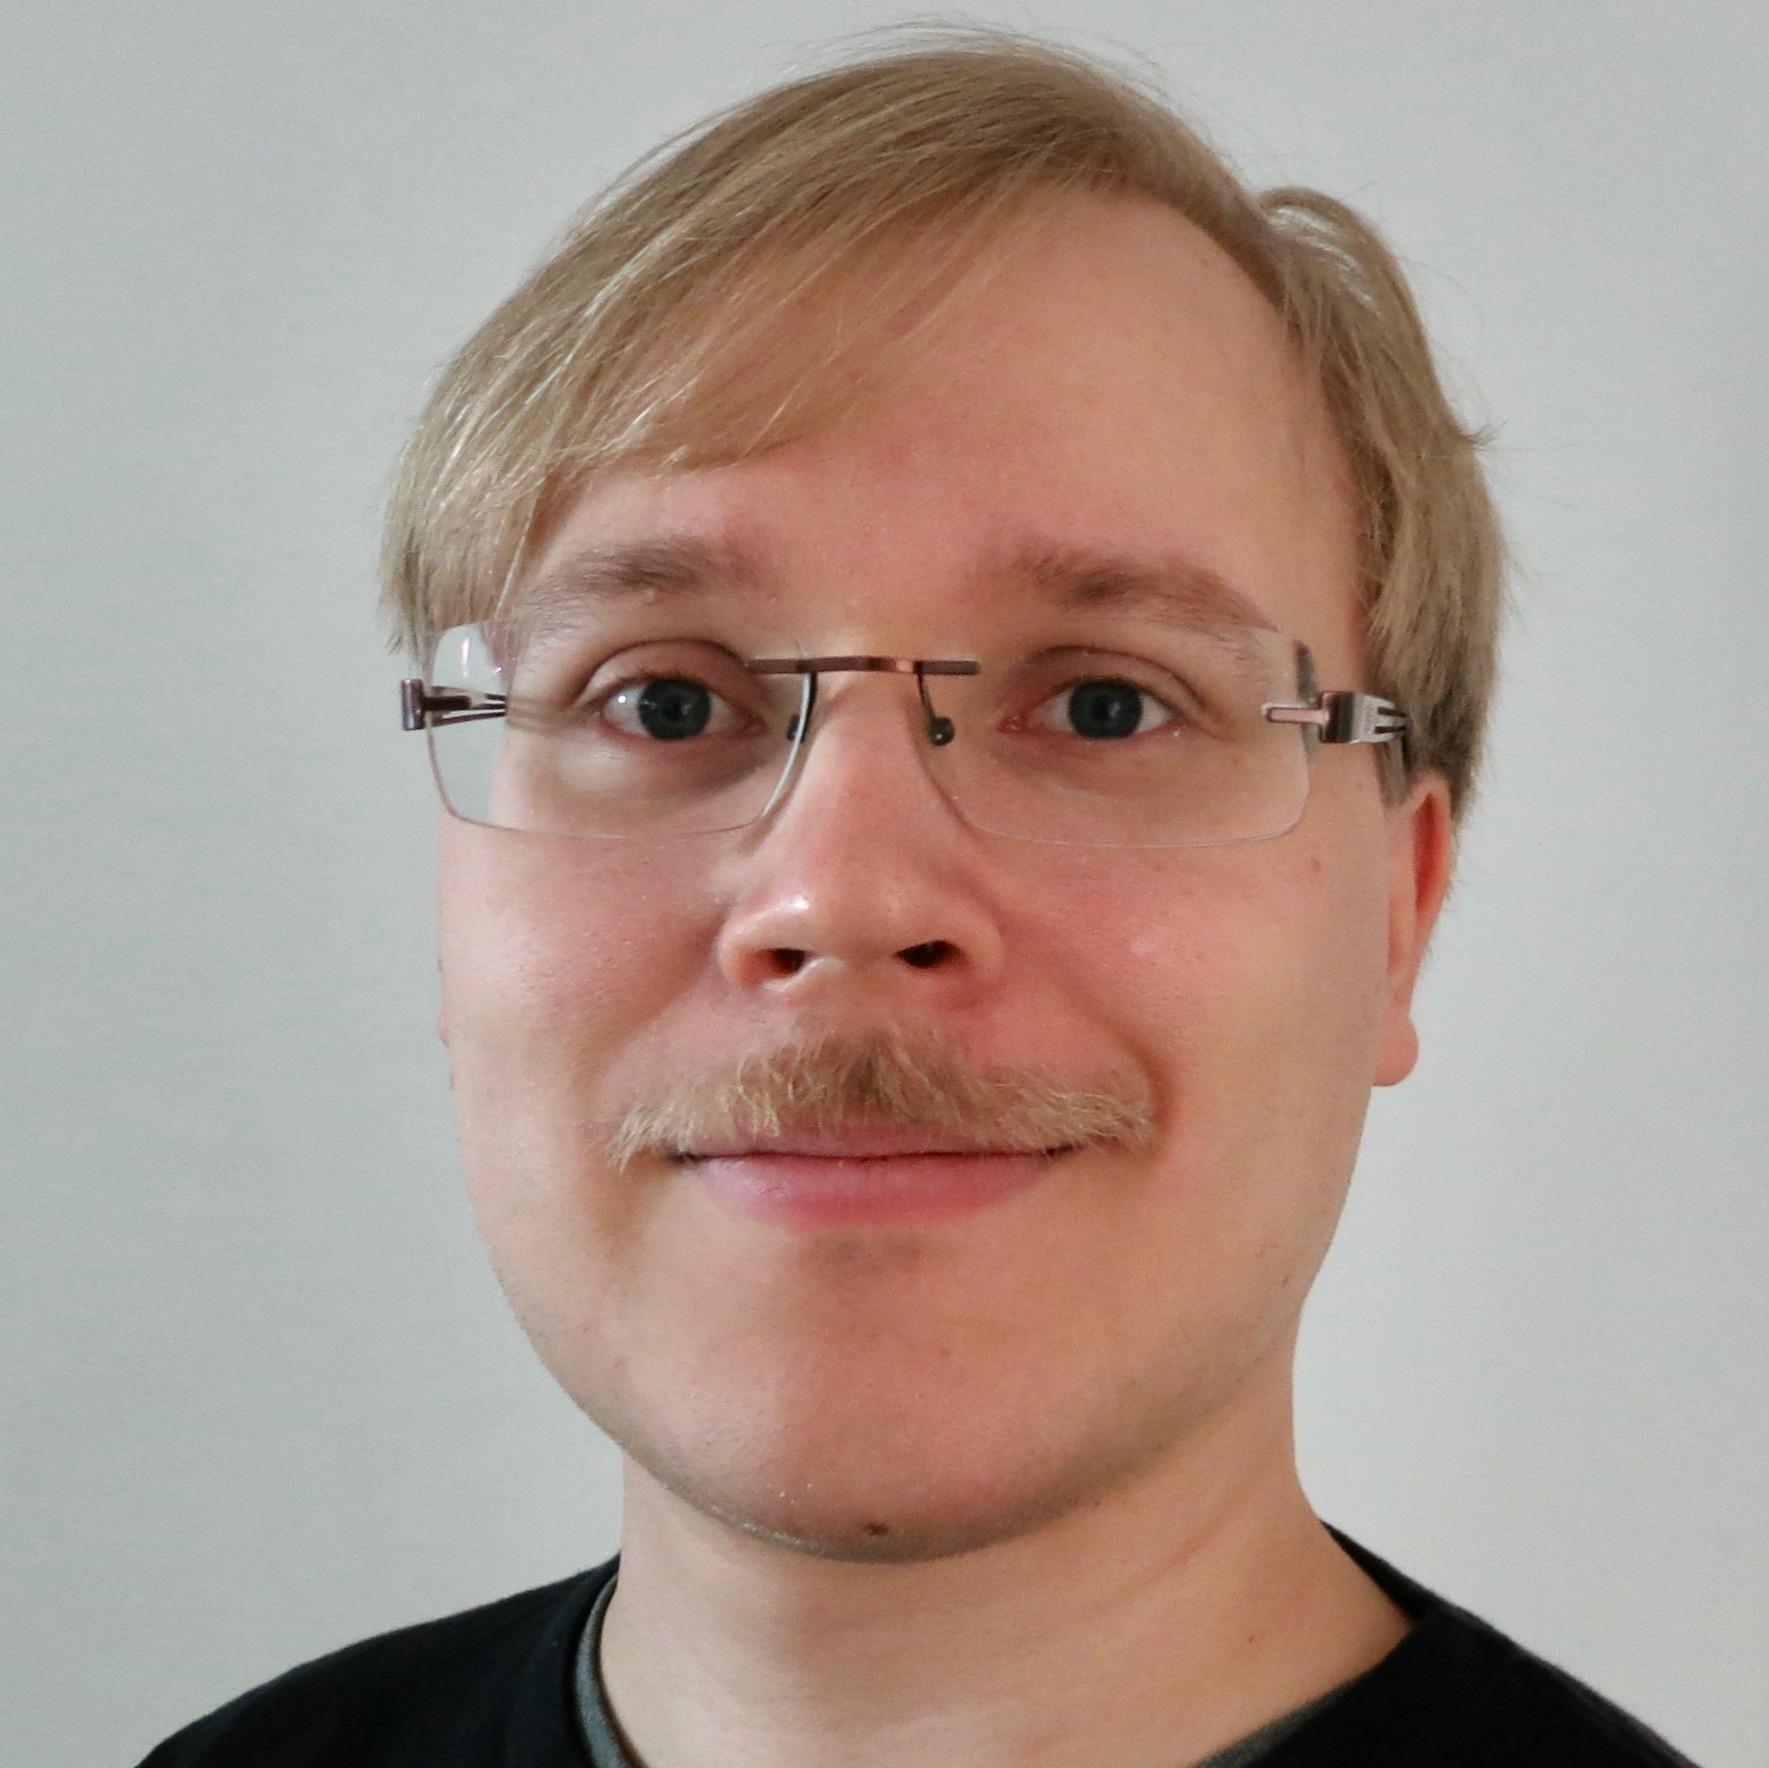 Heikki Nurmi